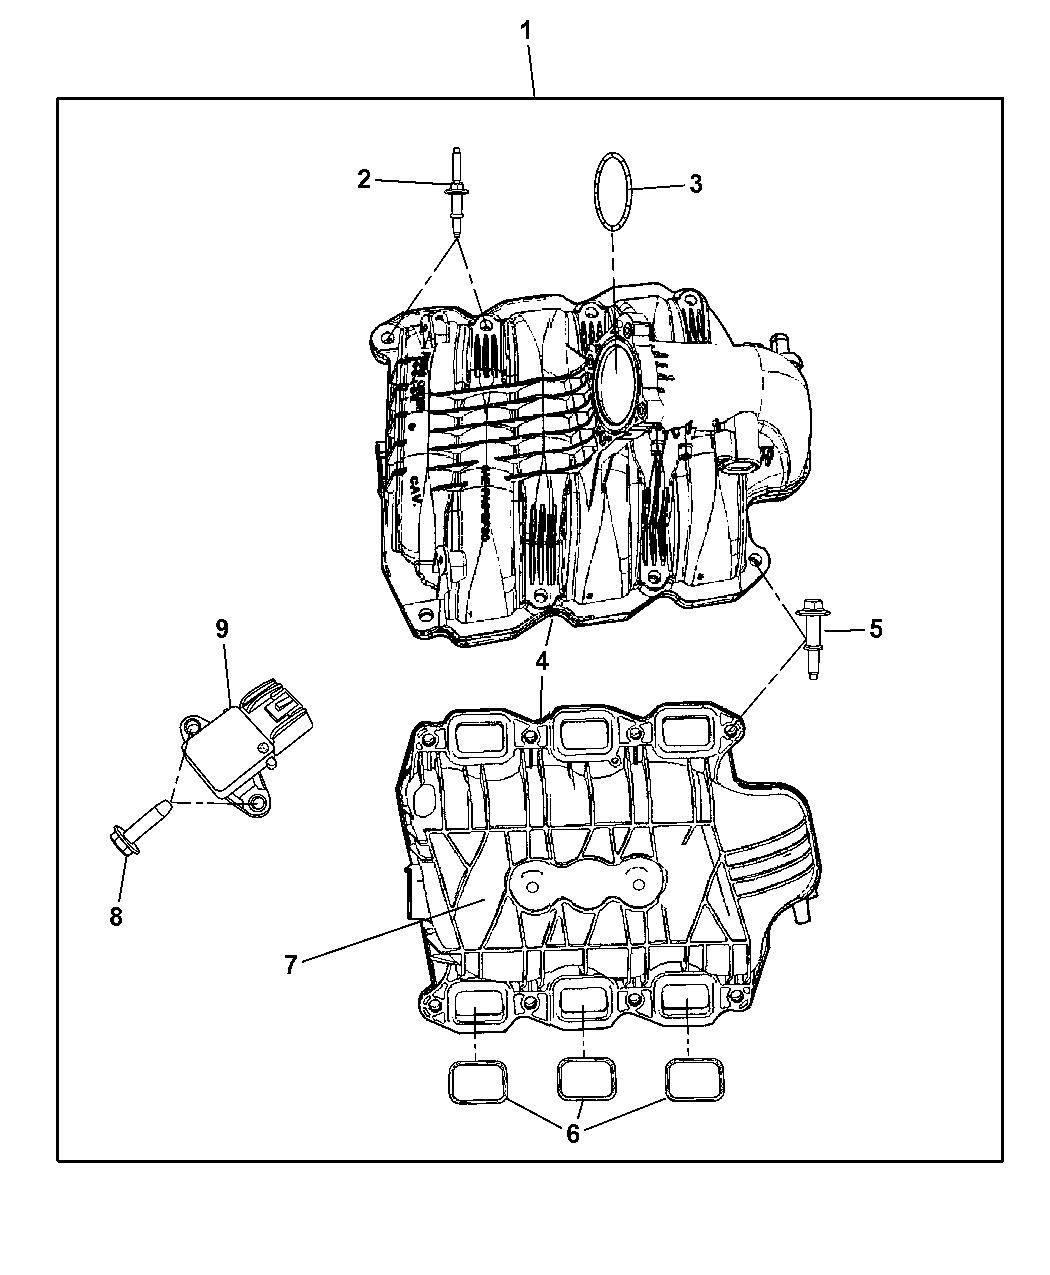 2011 Jeep Liberty Intake Manifold - Thumbnail 1